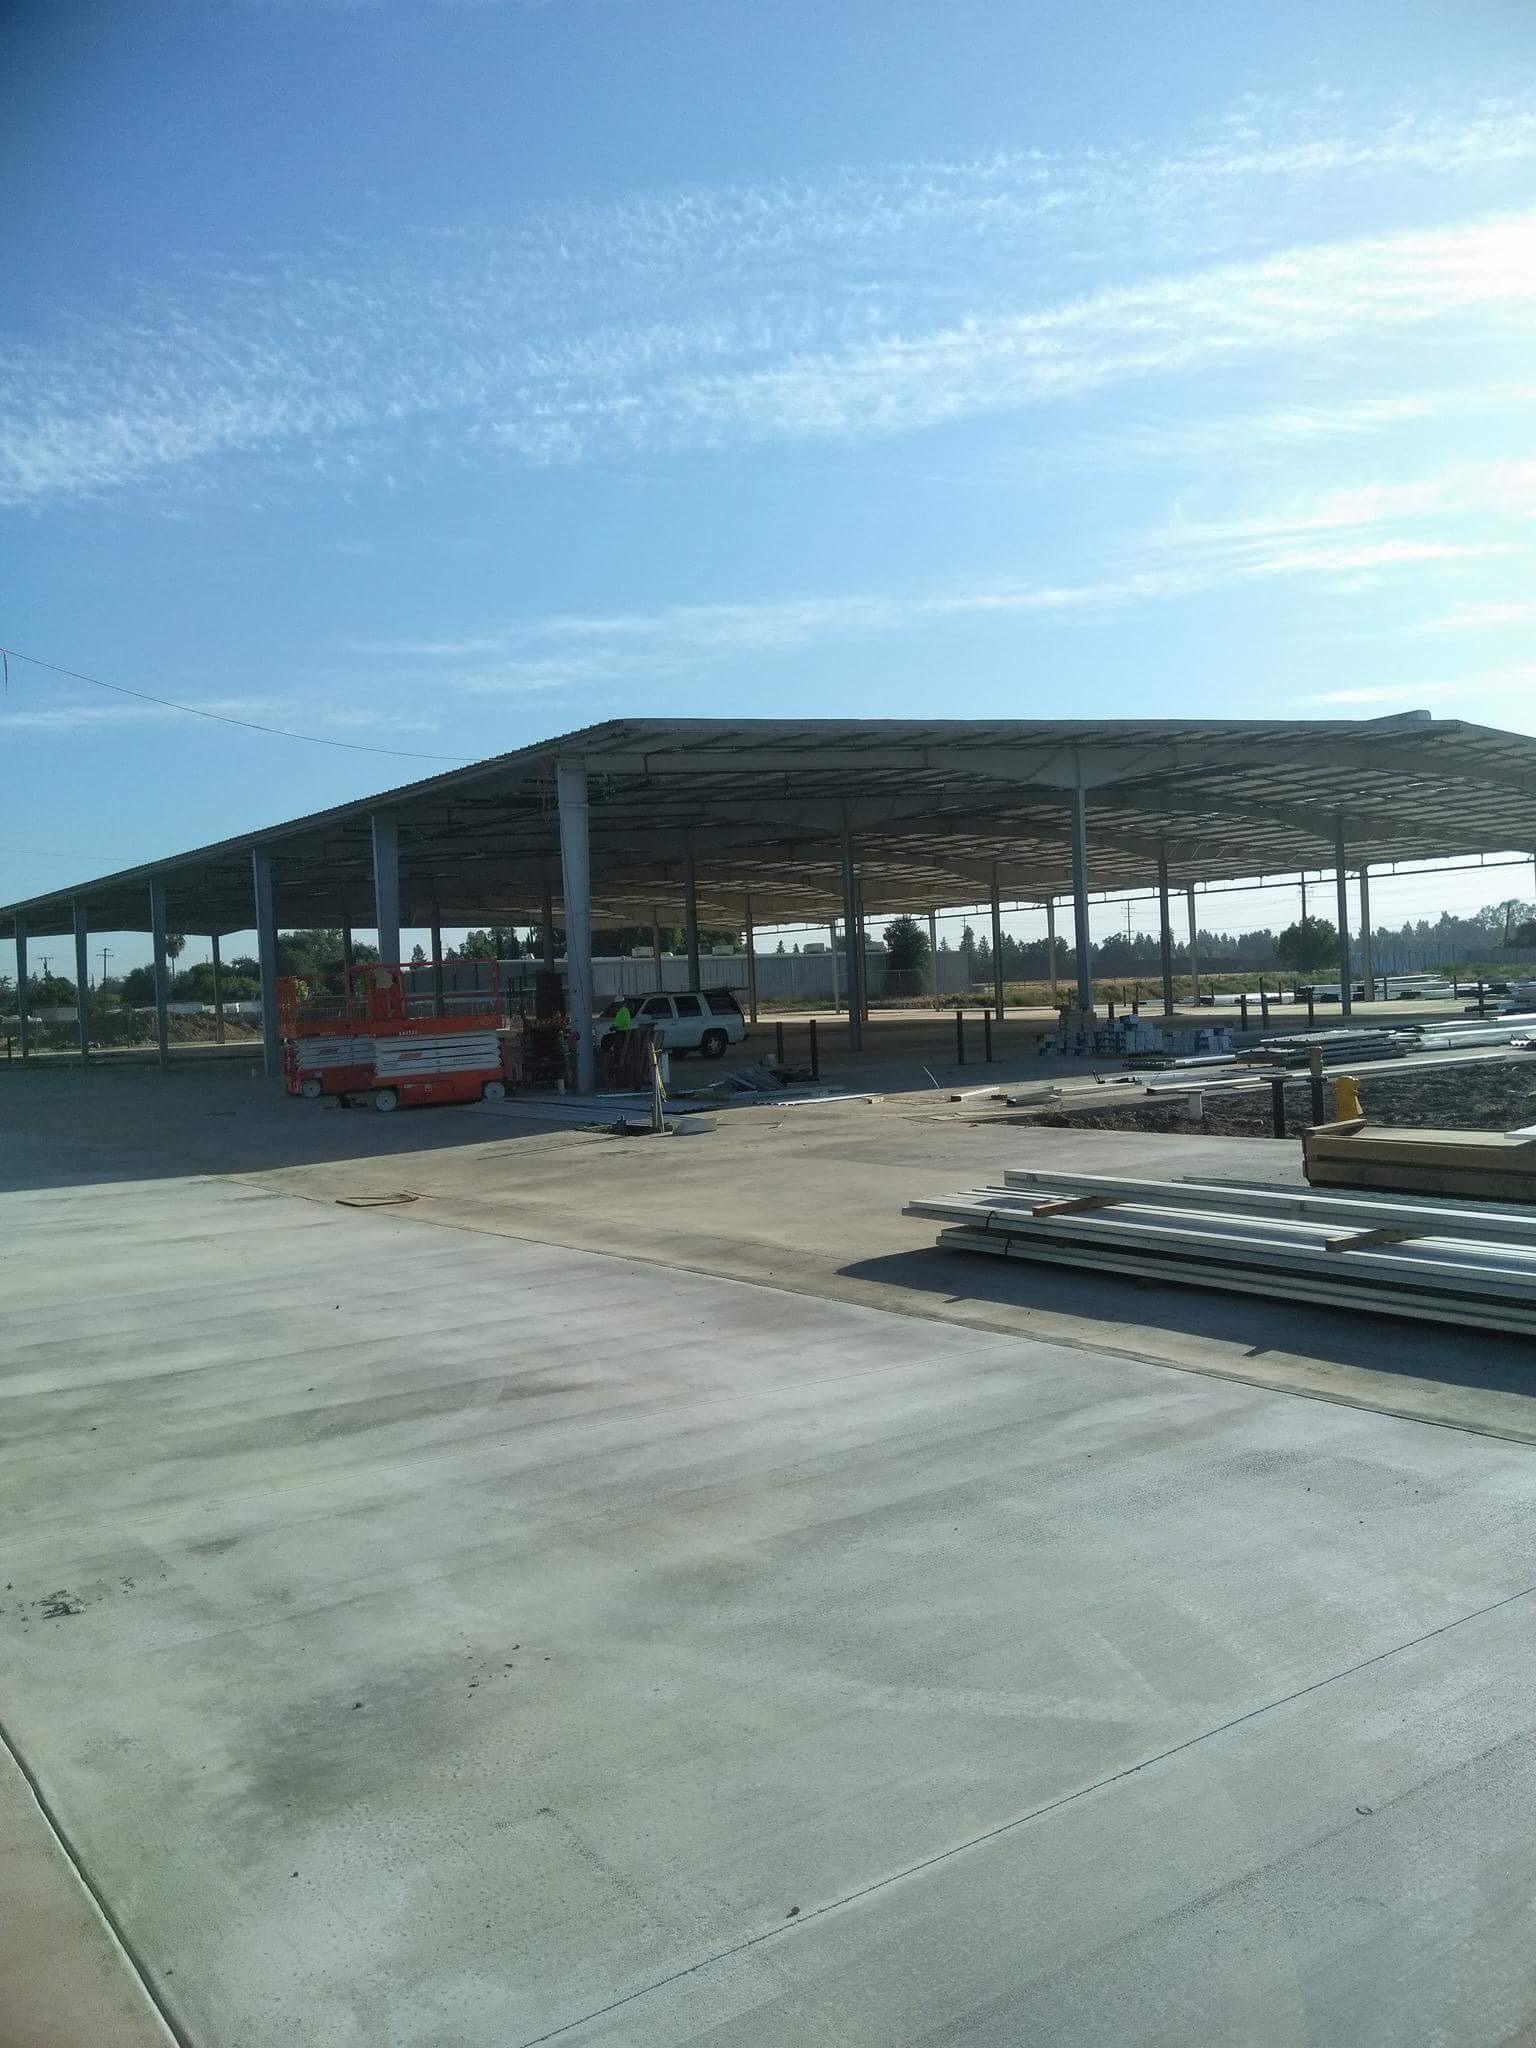 RV Storage & Self-Storage Building Conversion in Visalia, CA (IN PROGRESS)